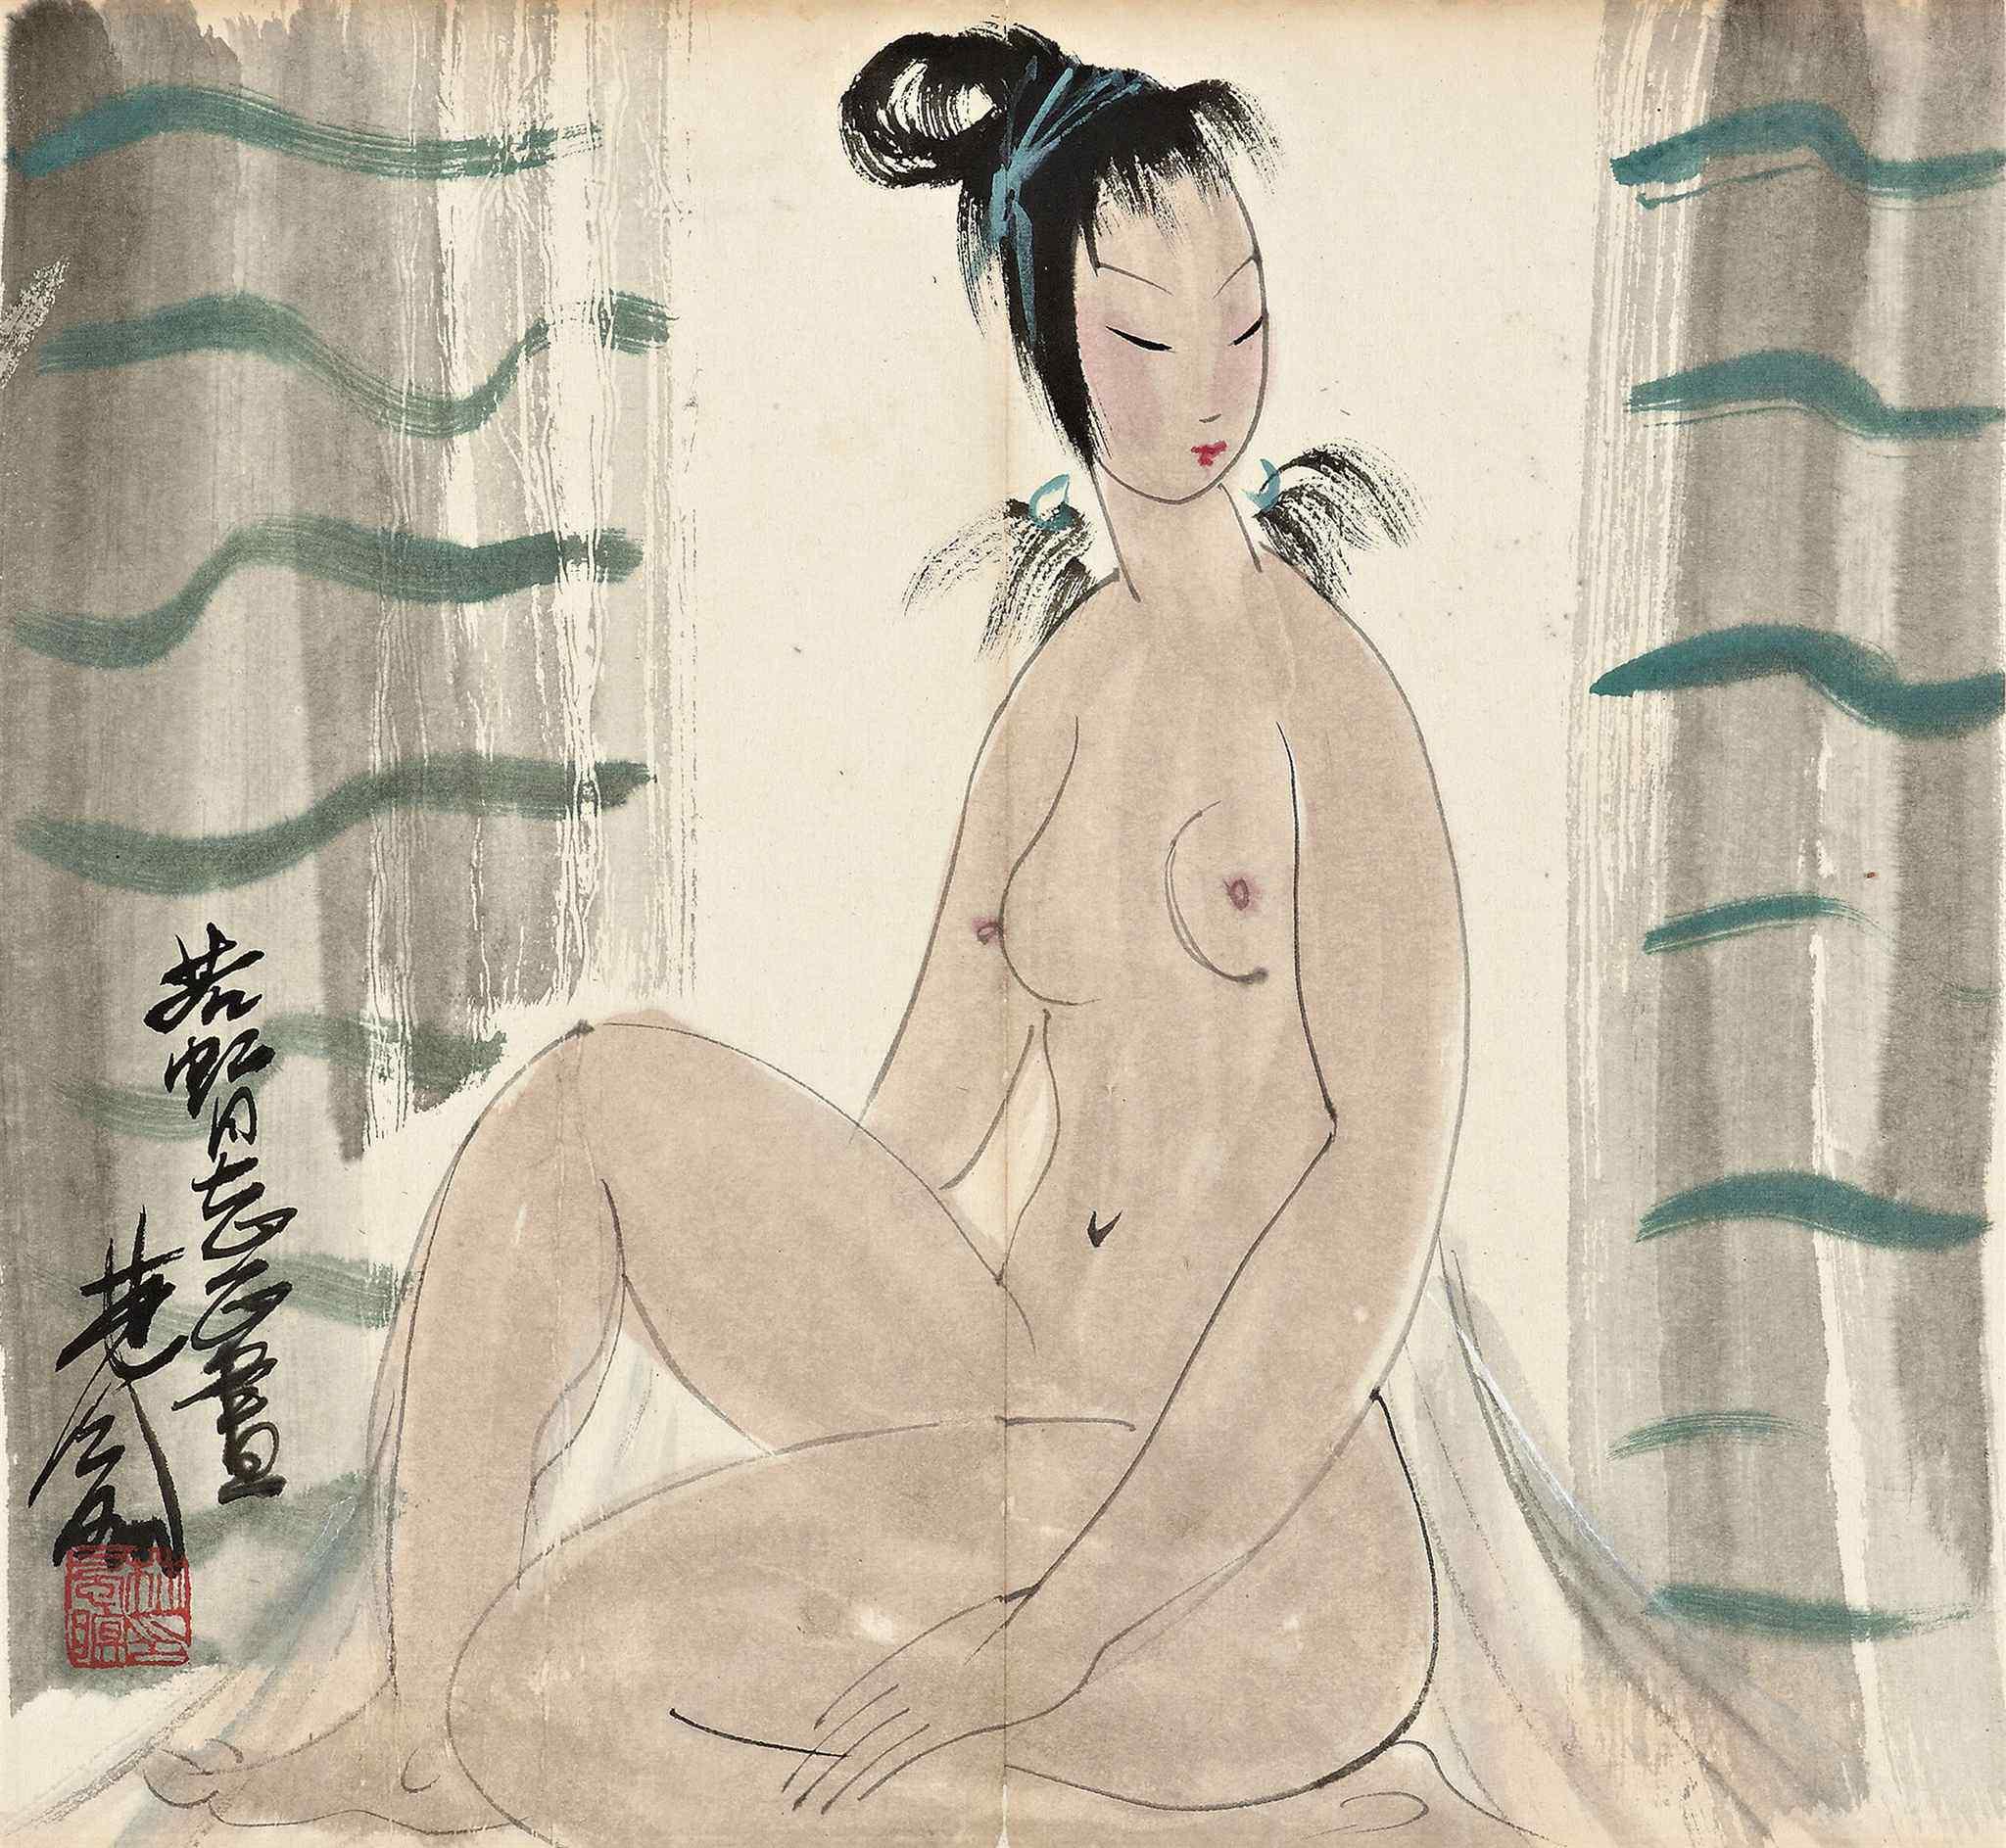 Lin Fengmian, 1900-1991. Обнаженная. 30.3 x 32.8 см. Частная коллекция